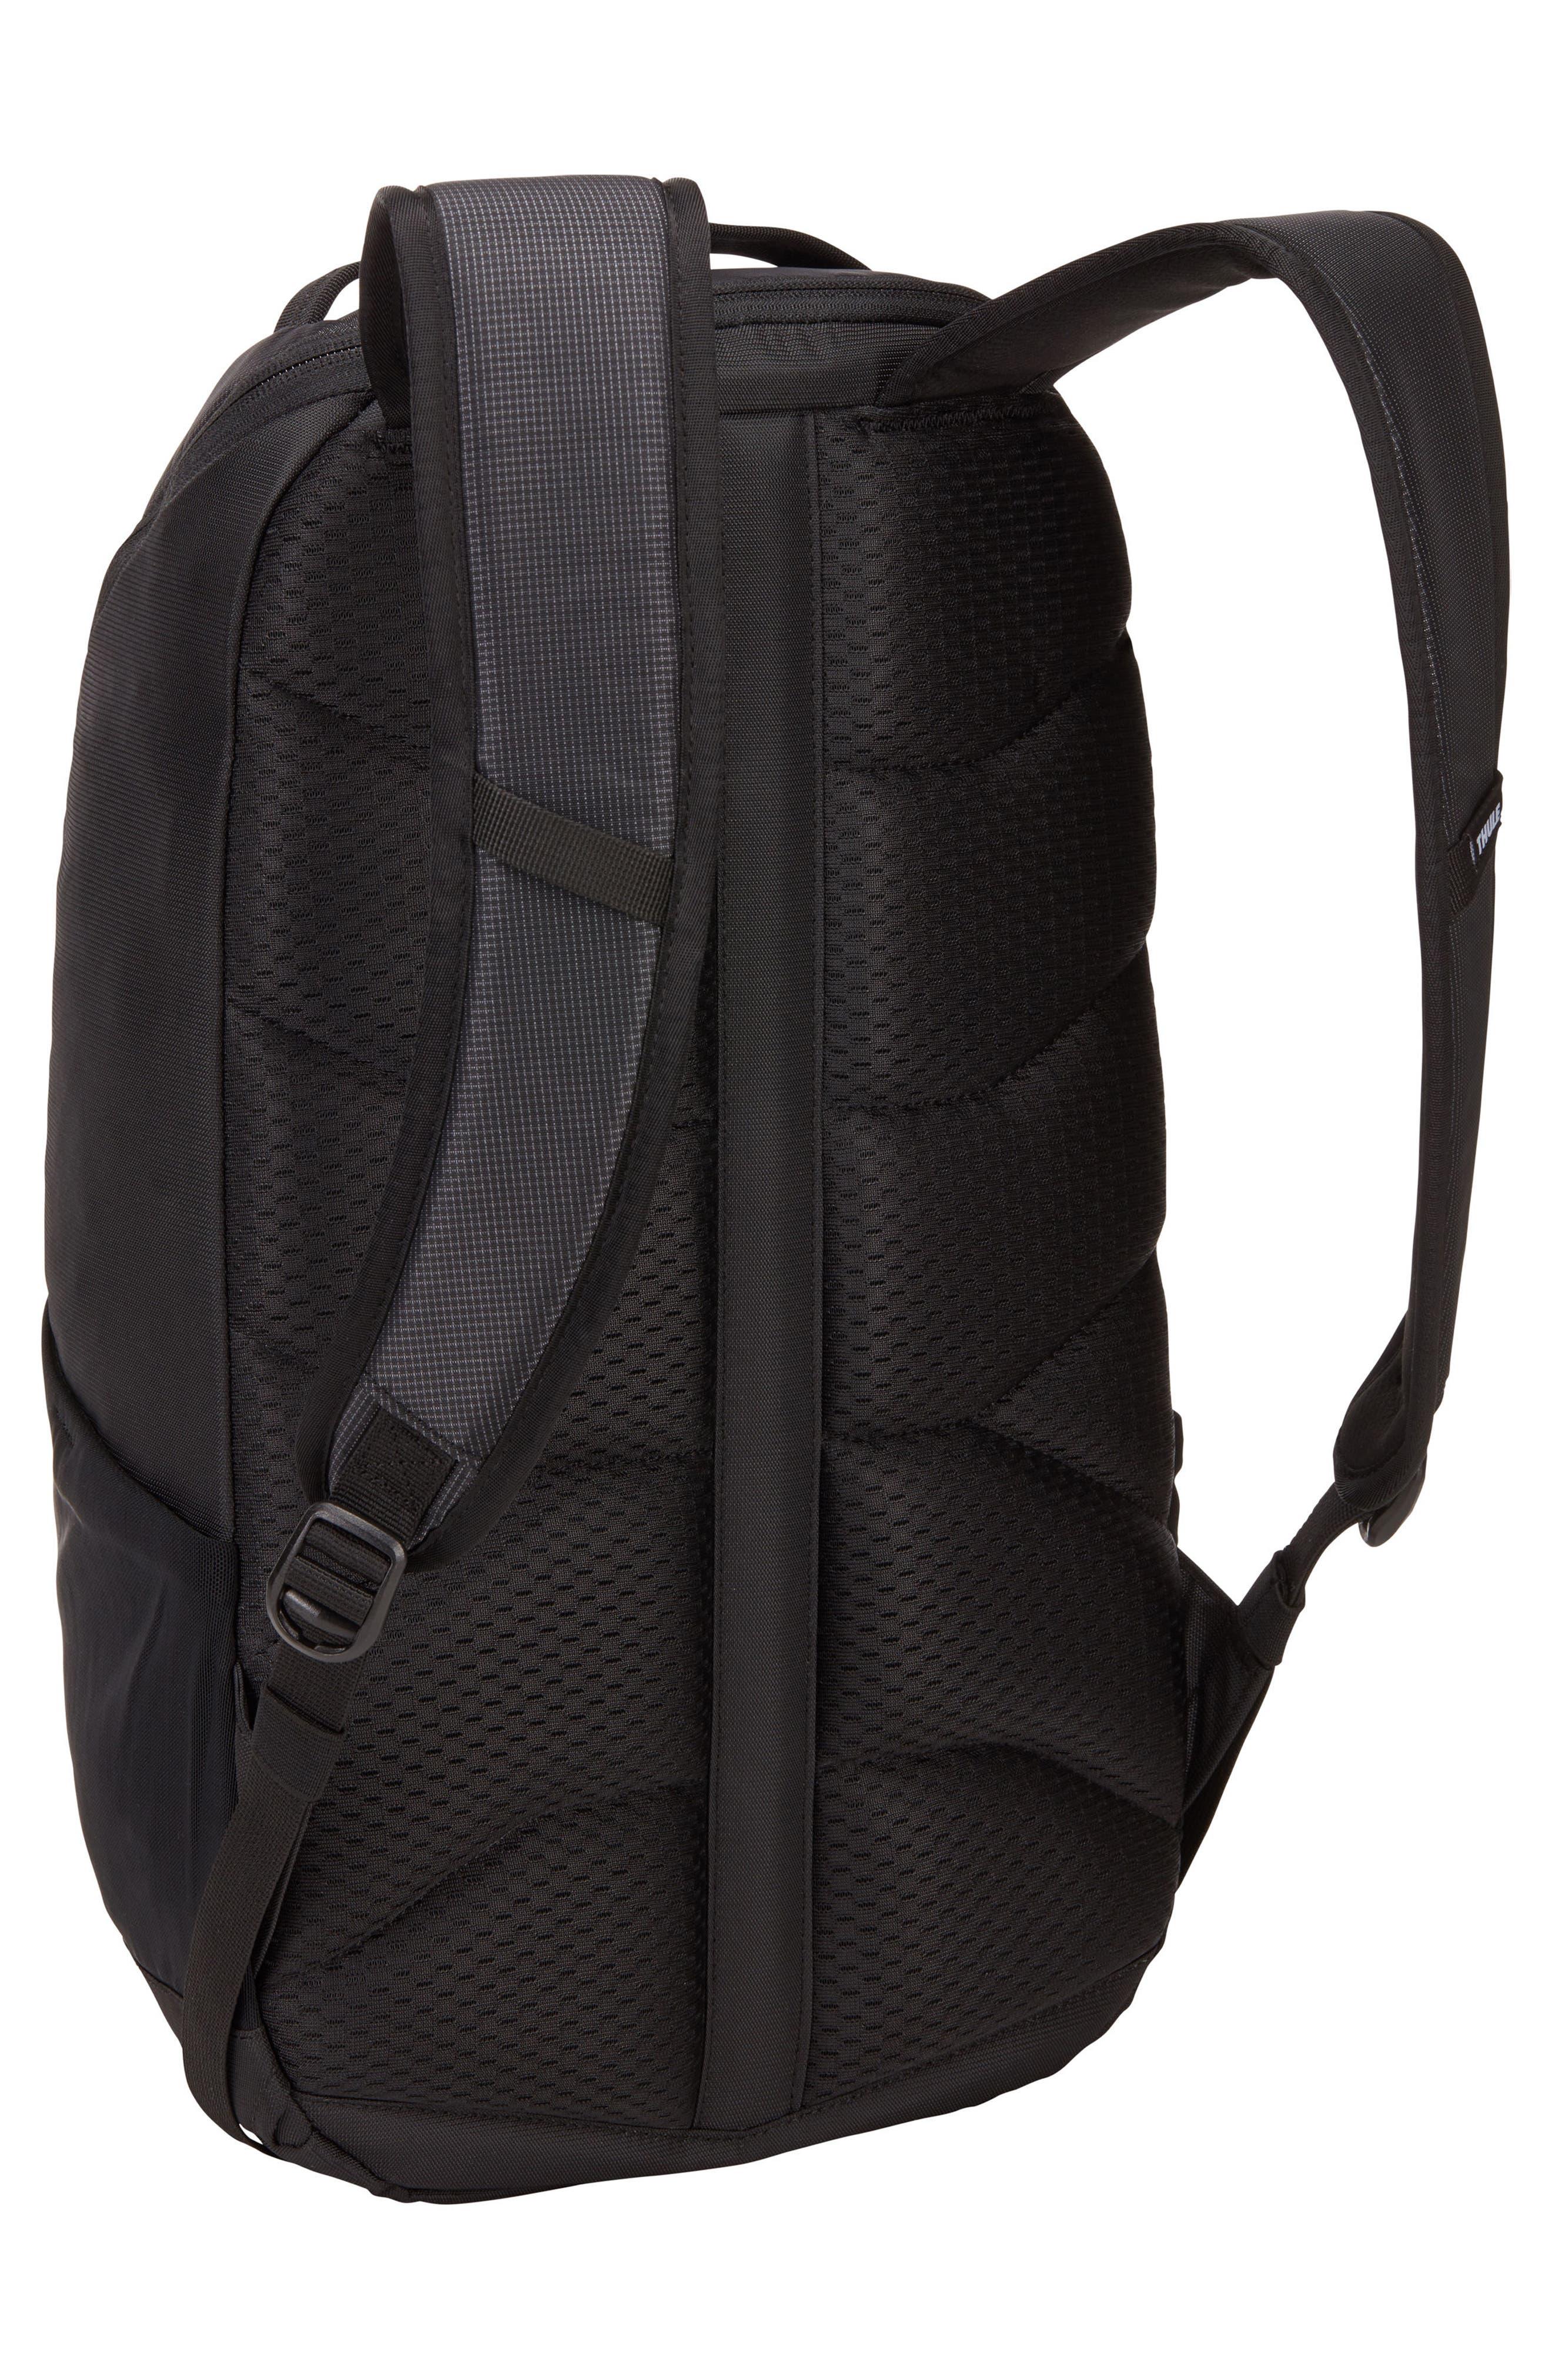 EnRoute Backpack,                             Alternate thumbnail 2, color,                             BLACK